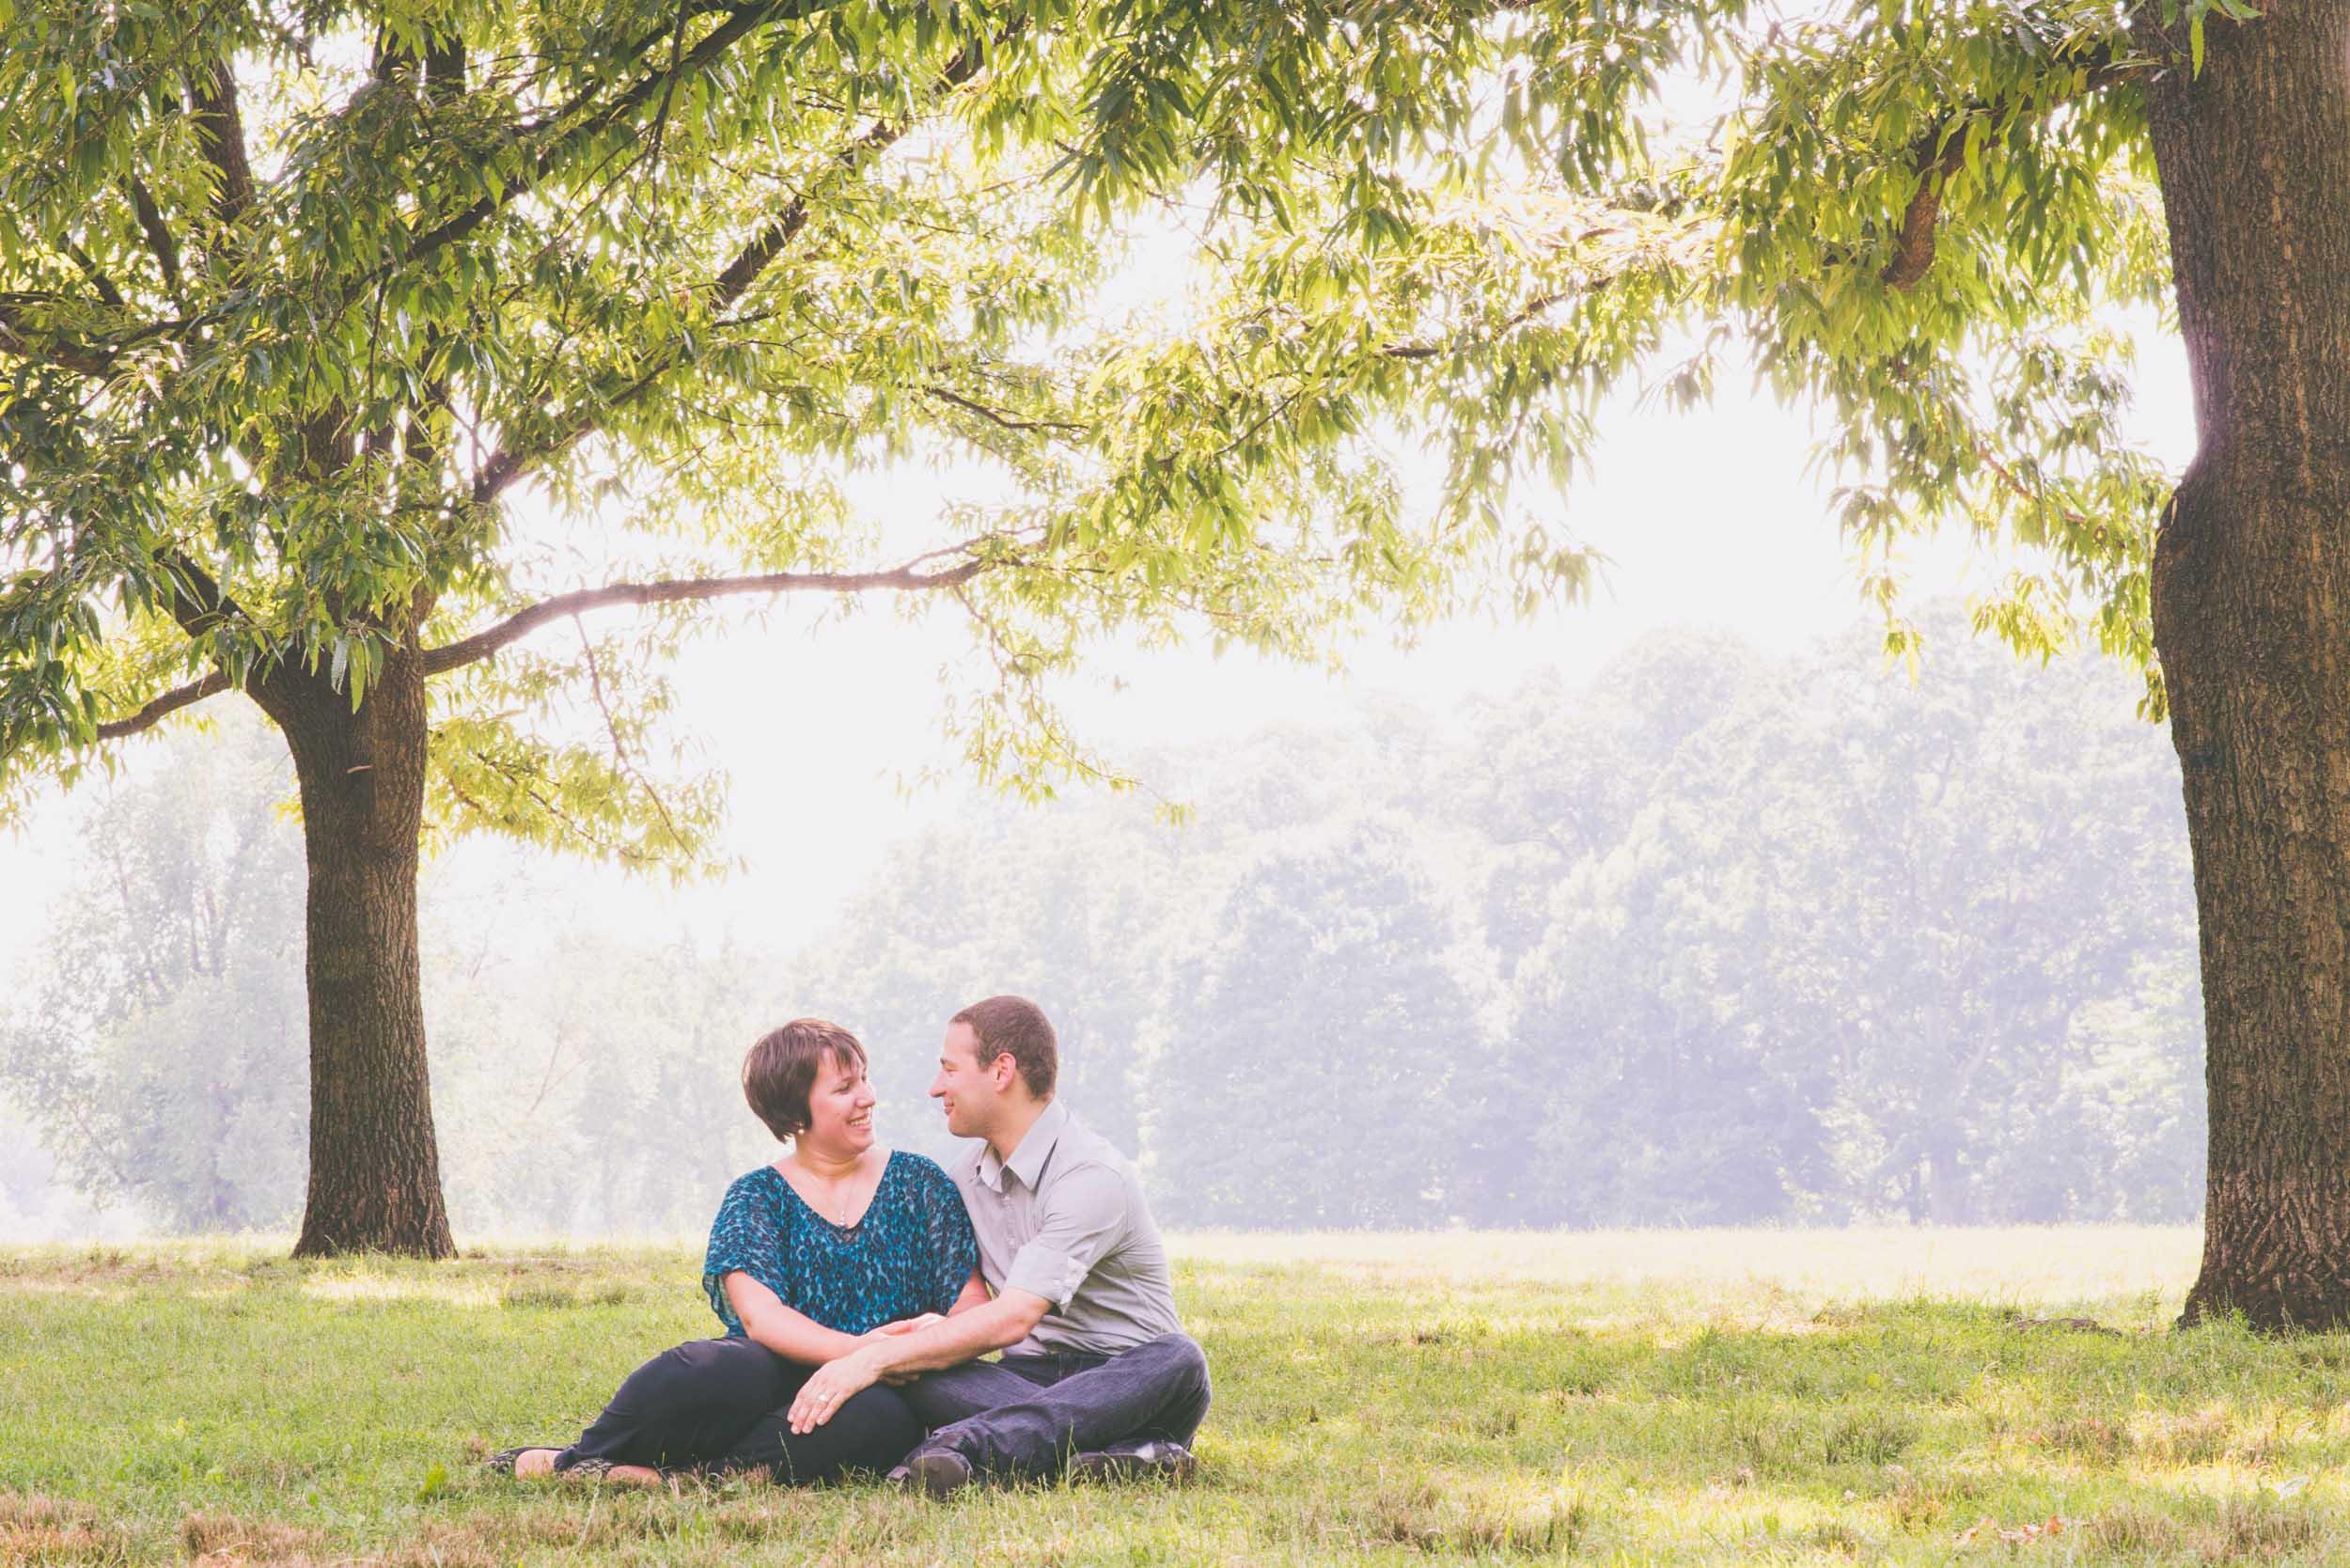 Couple between two trees - Engagement Portraits - Photo credit Nicola Bailey.jpg